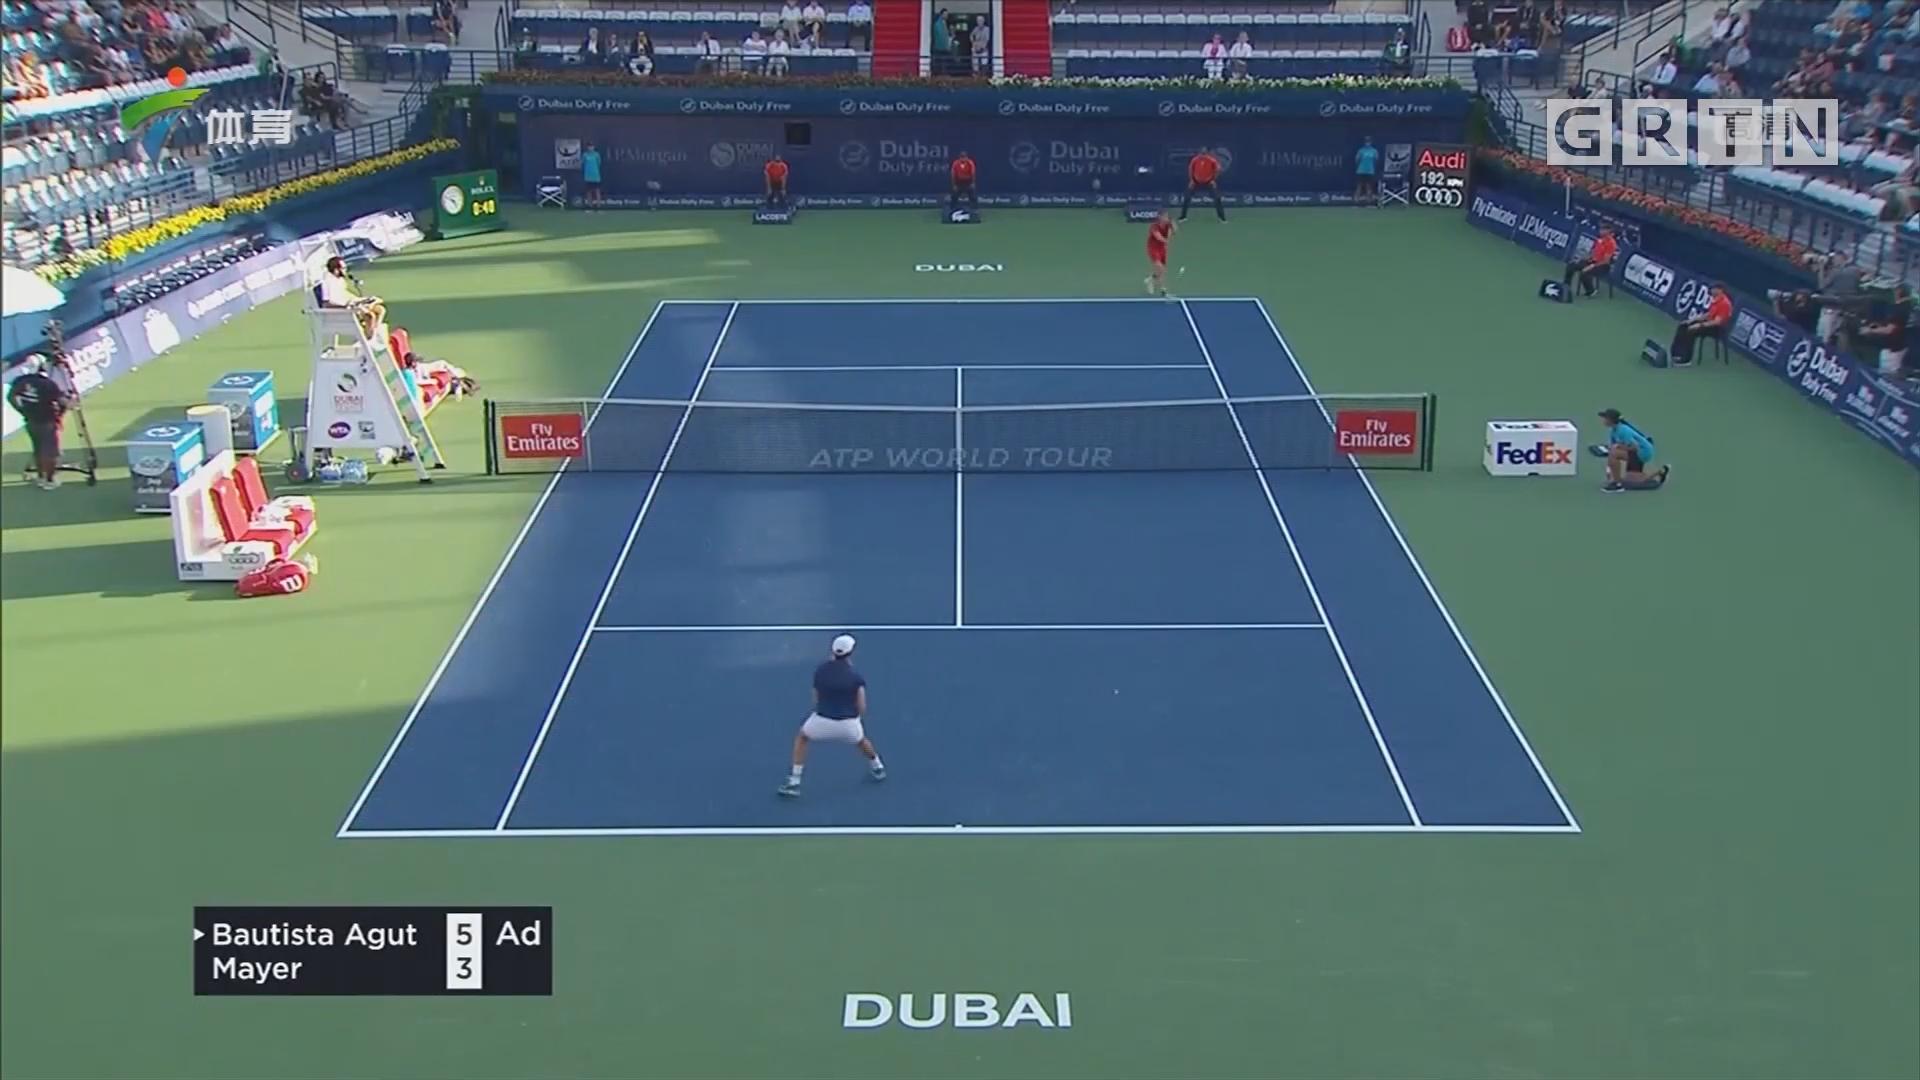 ATP迪拜赛 阿古特、帕尔雷晋级次轮